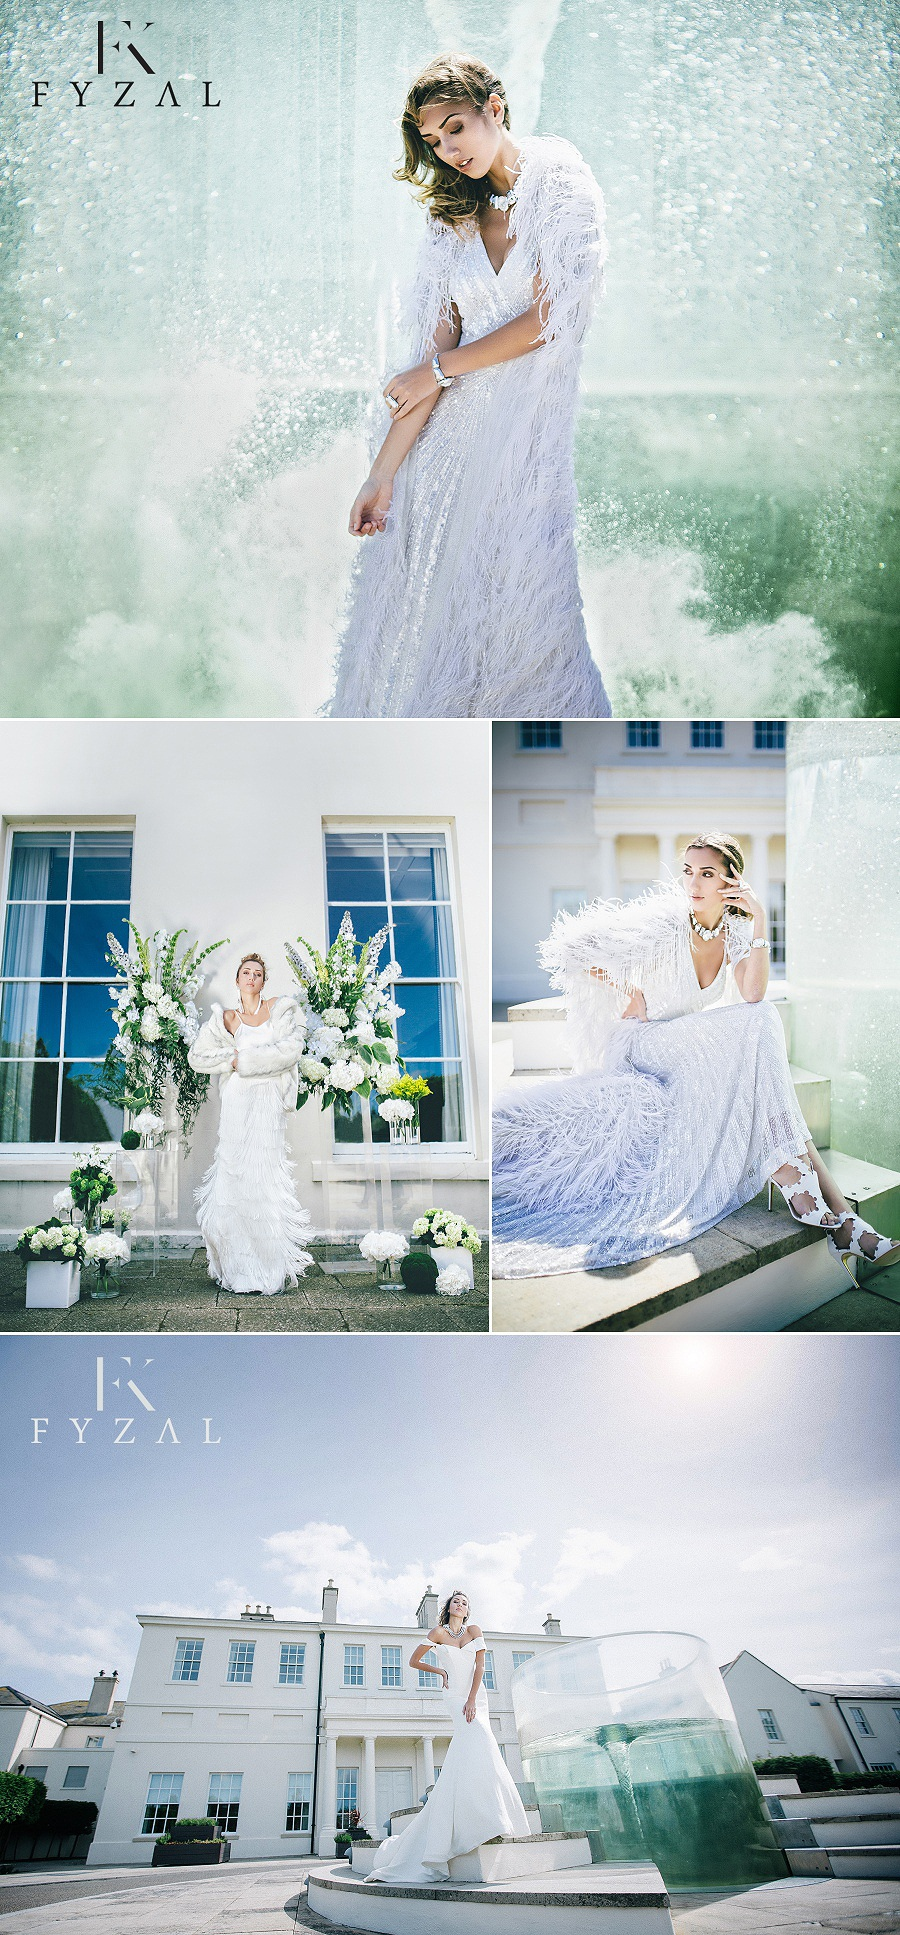 Belle-Bridal-AW17-Editorial 1.jpg